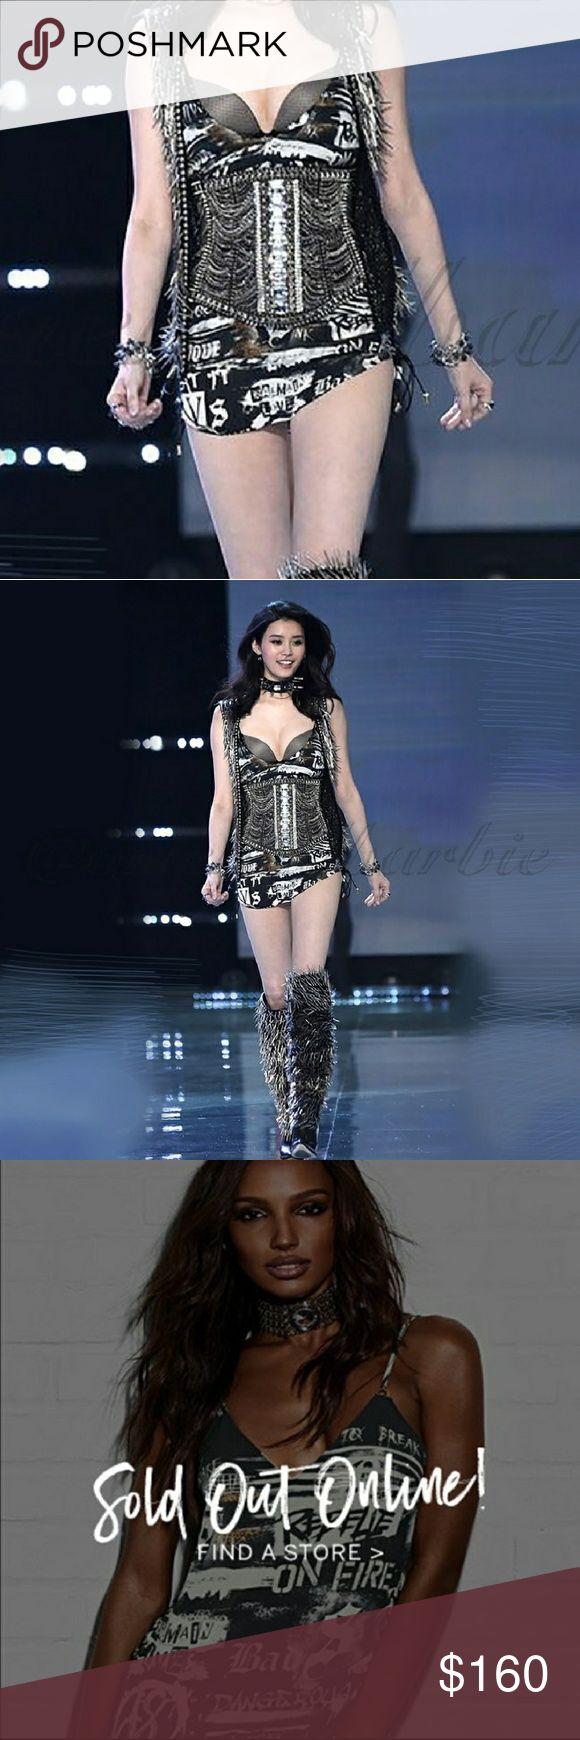 Balmain Slip Dress Size M New, fits similar to model. Sold out online i 10 minutes. New in bag. Balmain Dresses Mini